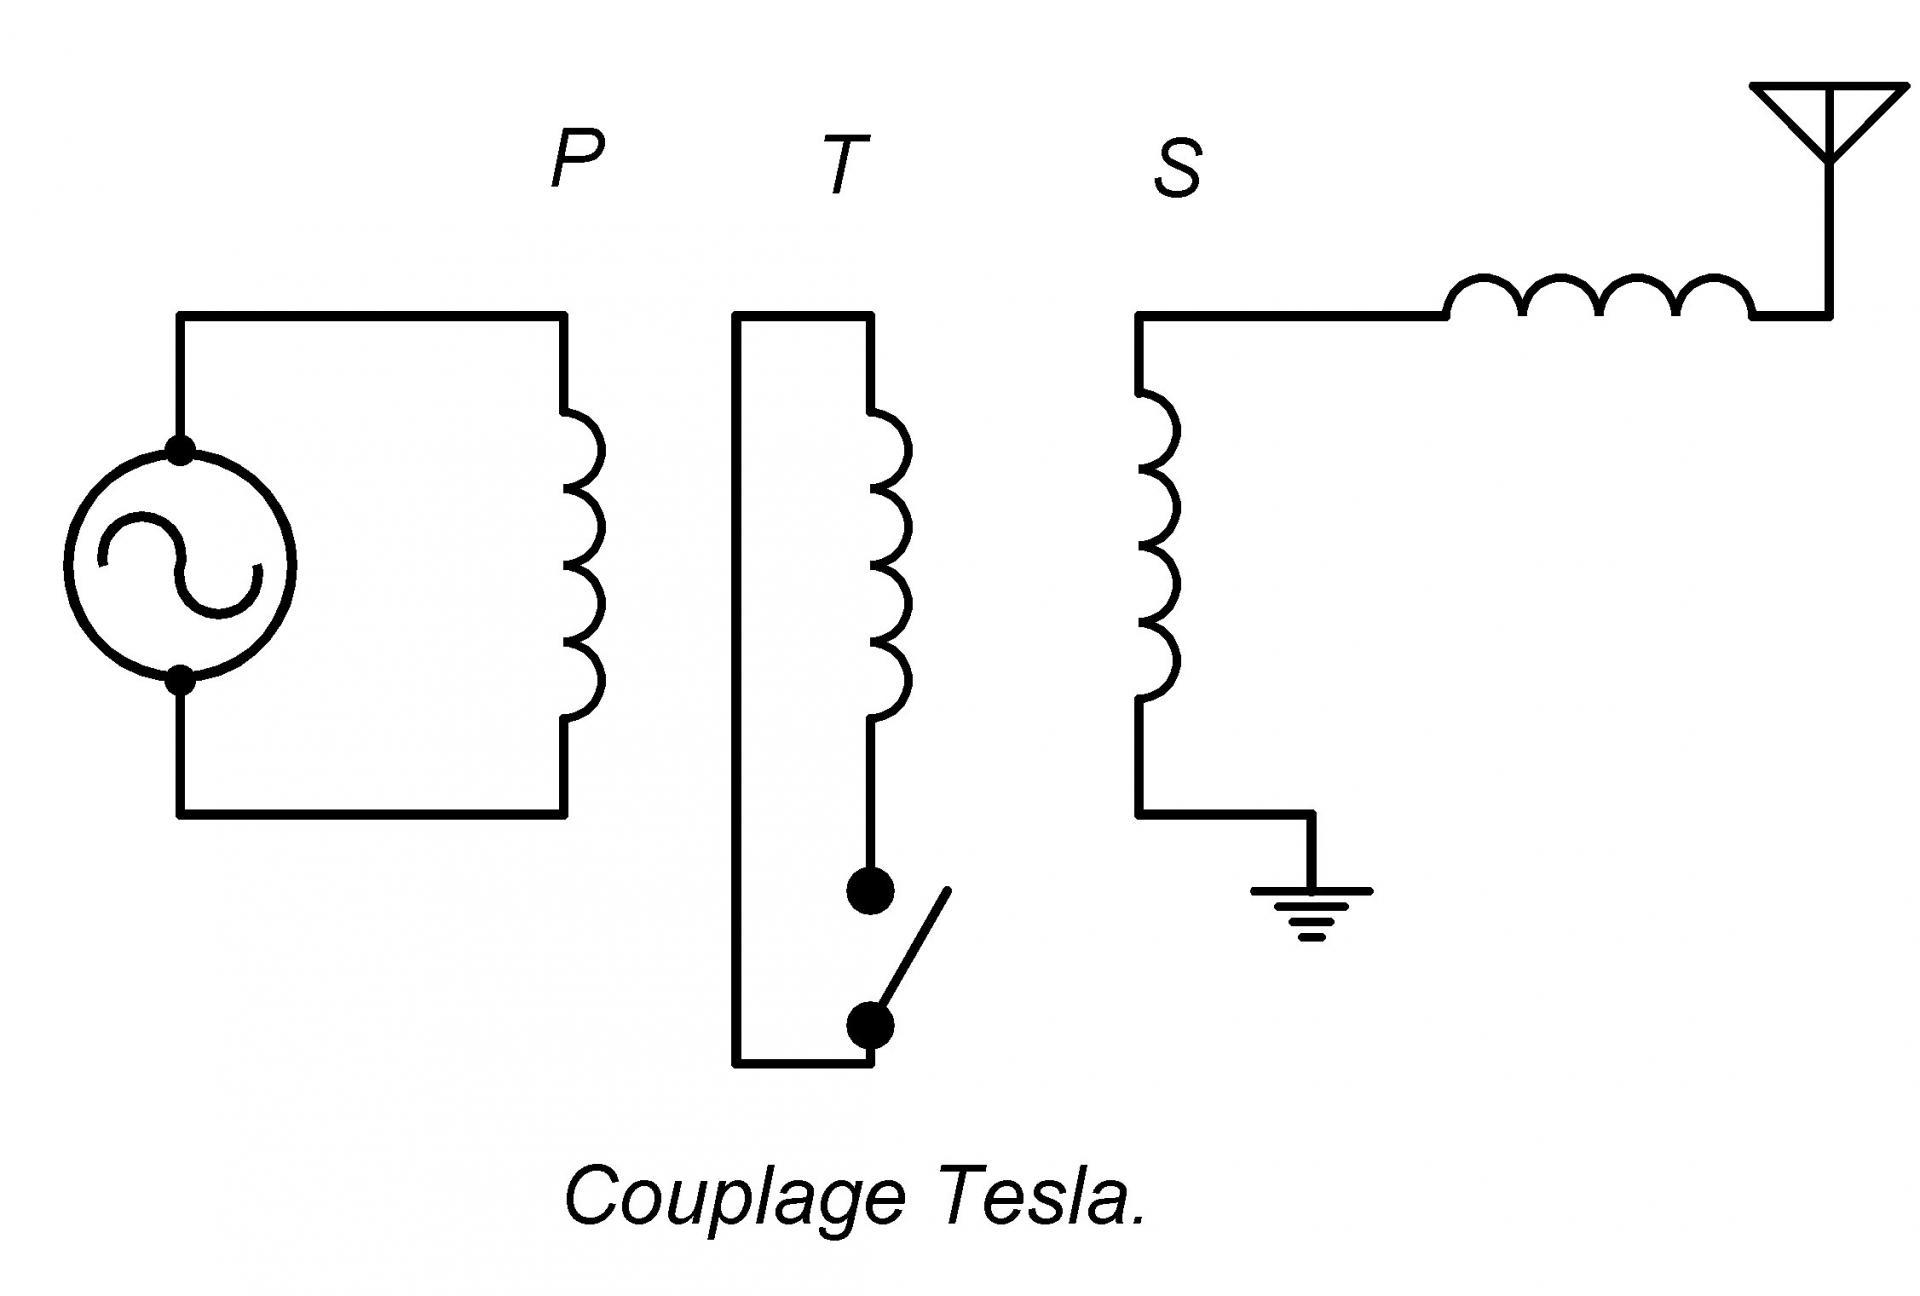 Couplage tesla